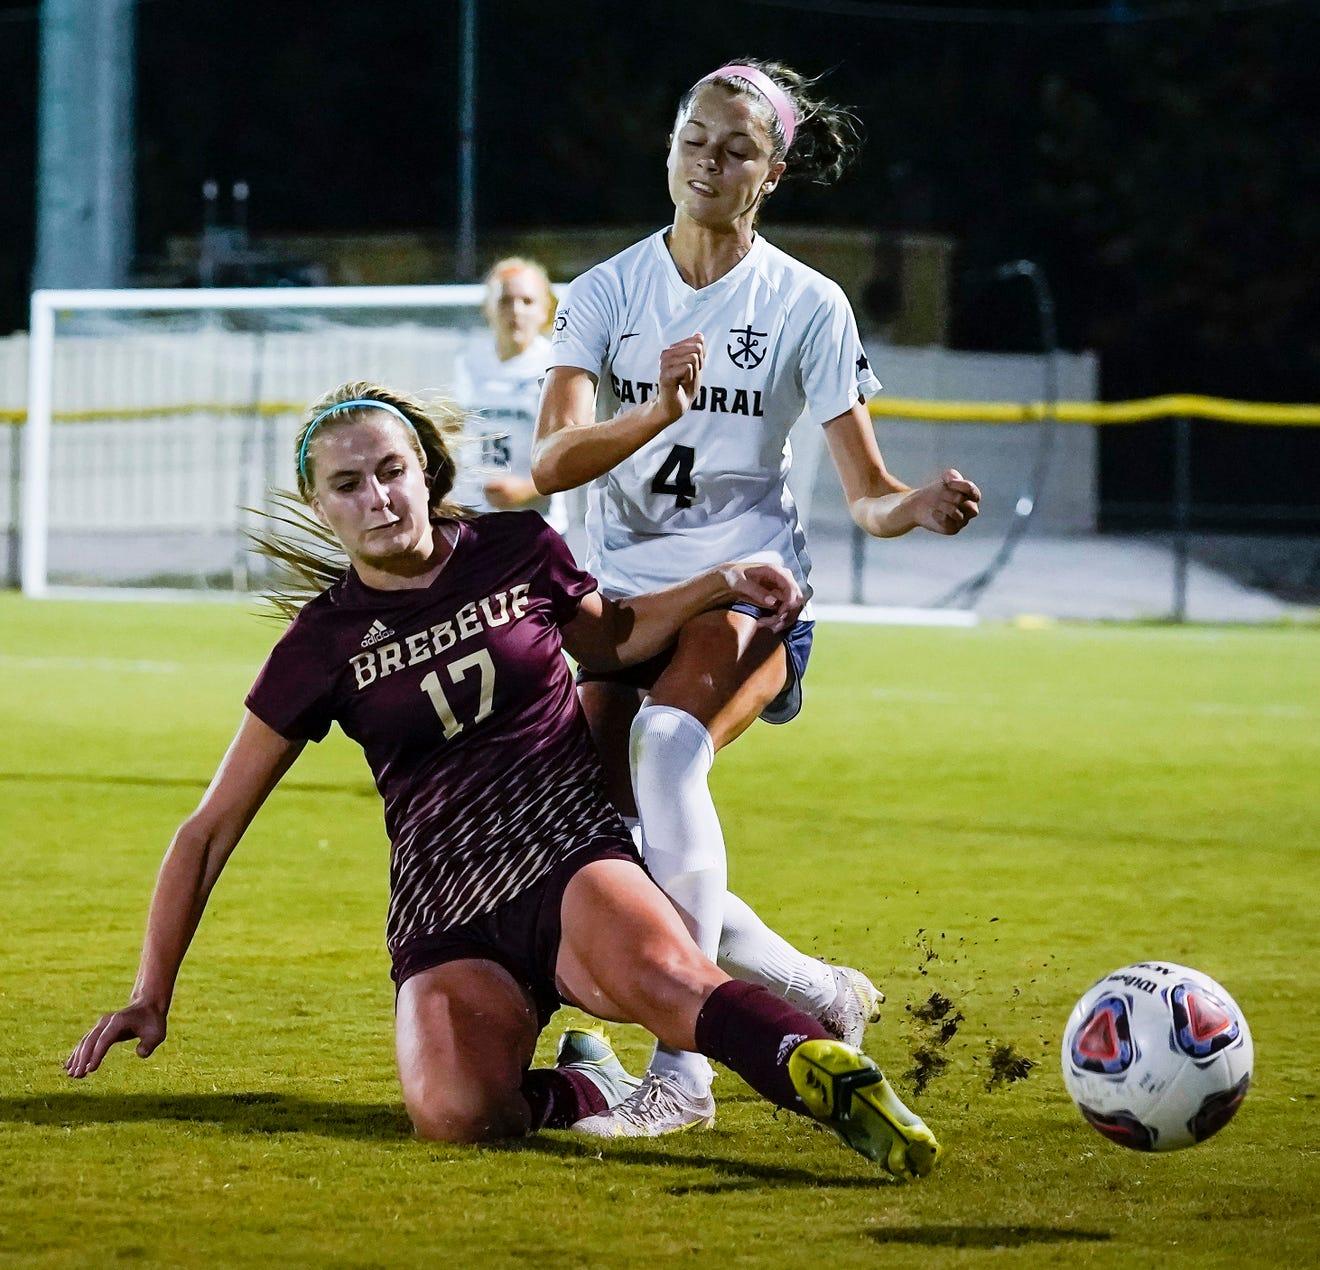 Girls soccer: Brebeufs Josie Studley makes return to